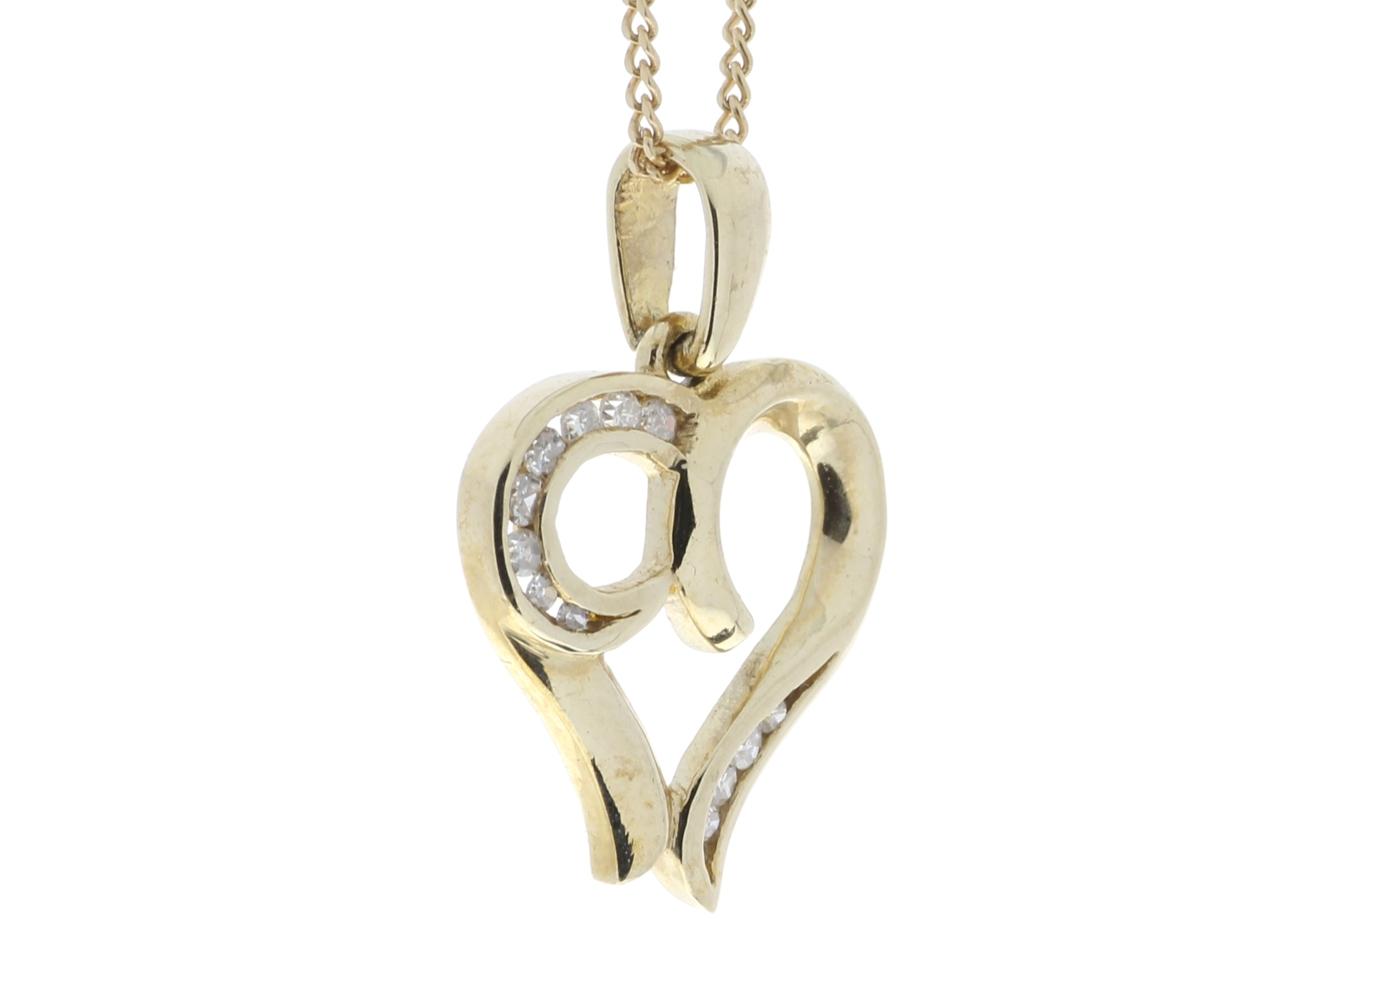 9ct Yellow Gold Diamond Heart Pendant - Image 2 of 4